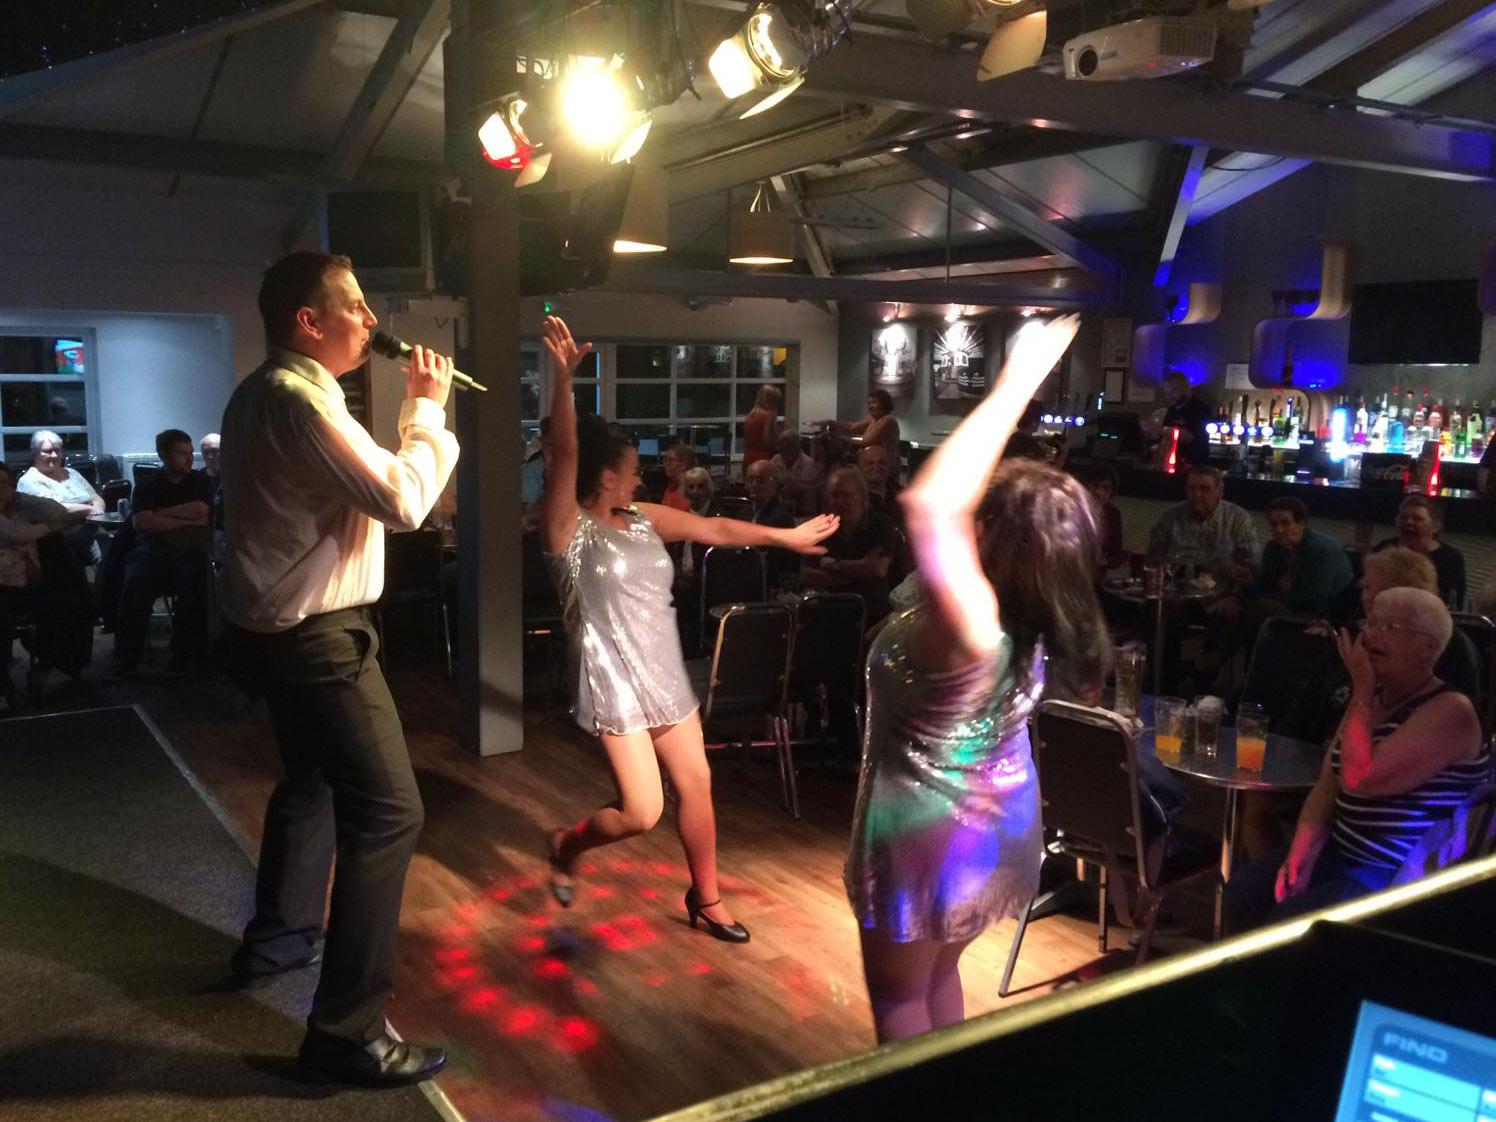 club-belle-aire-entertainment-dancers.jpg